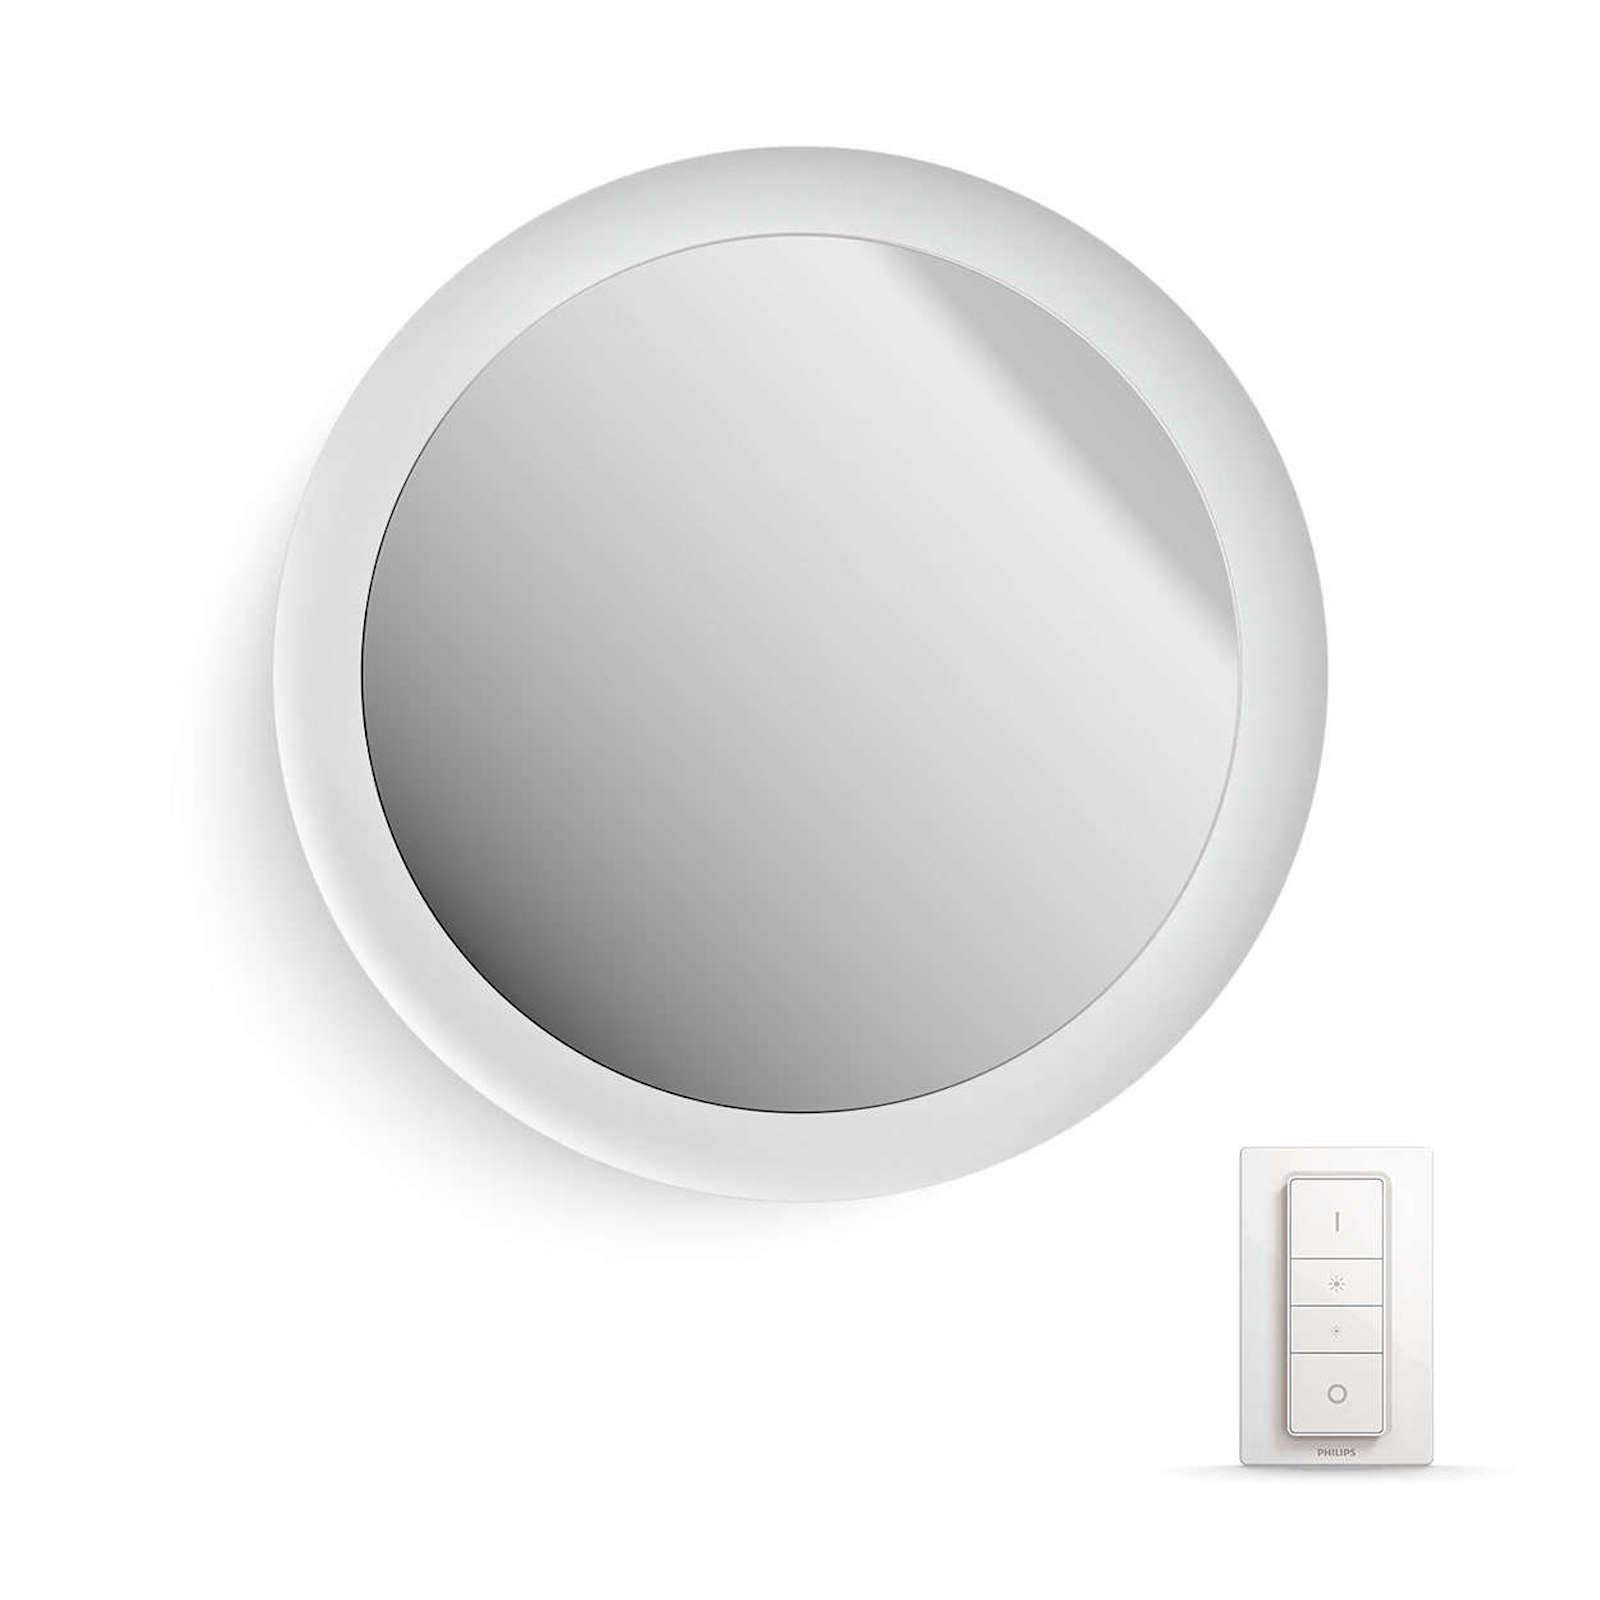 Mirror-Lights-from-Philips-Hue-2.jpeg